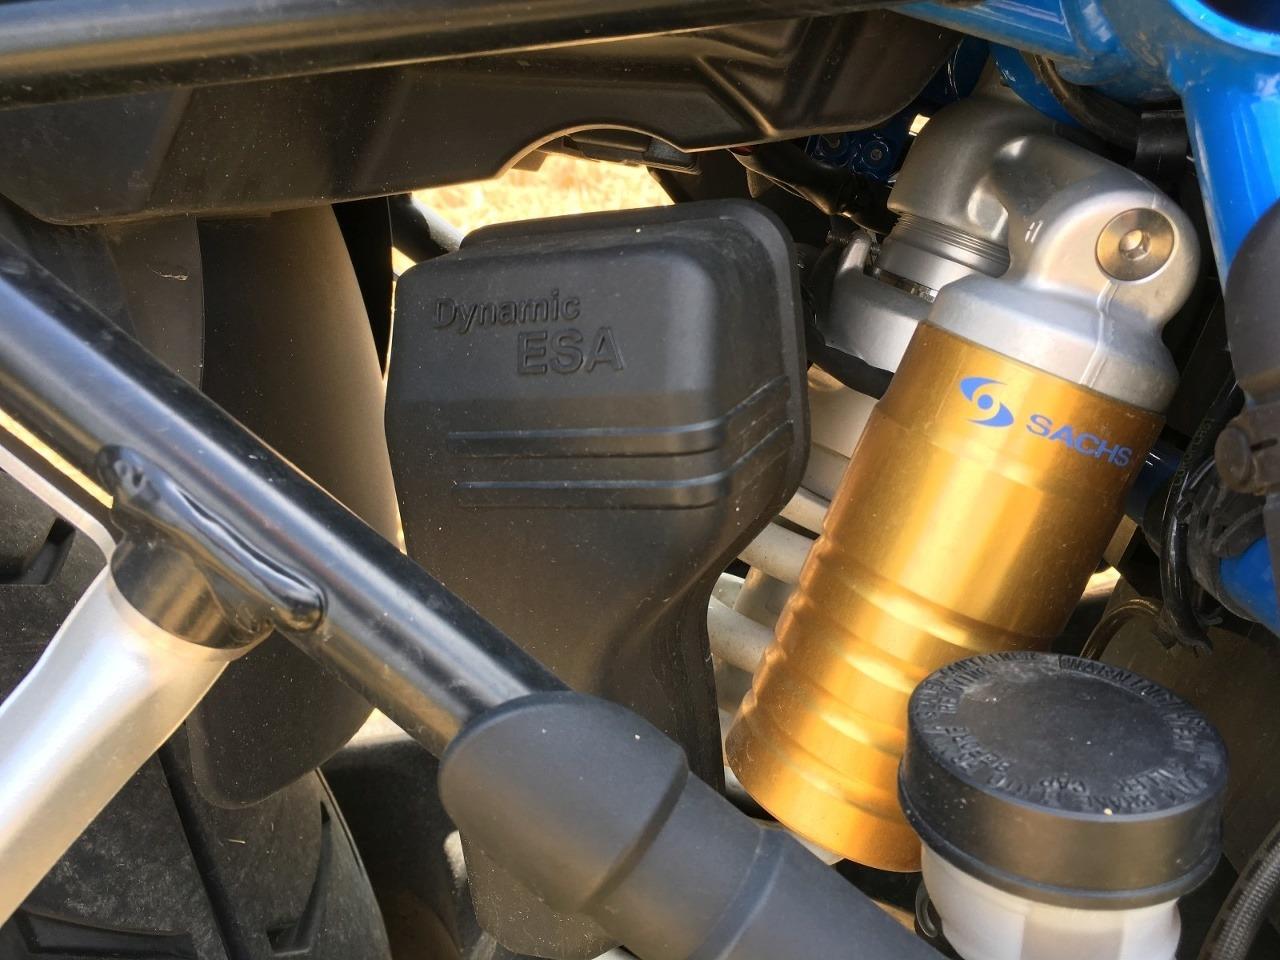 BMW R1200 GS Rallye